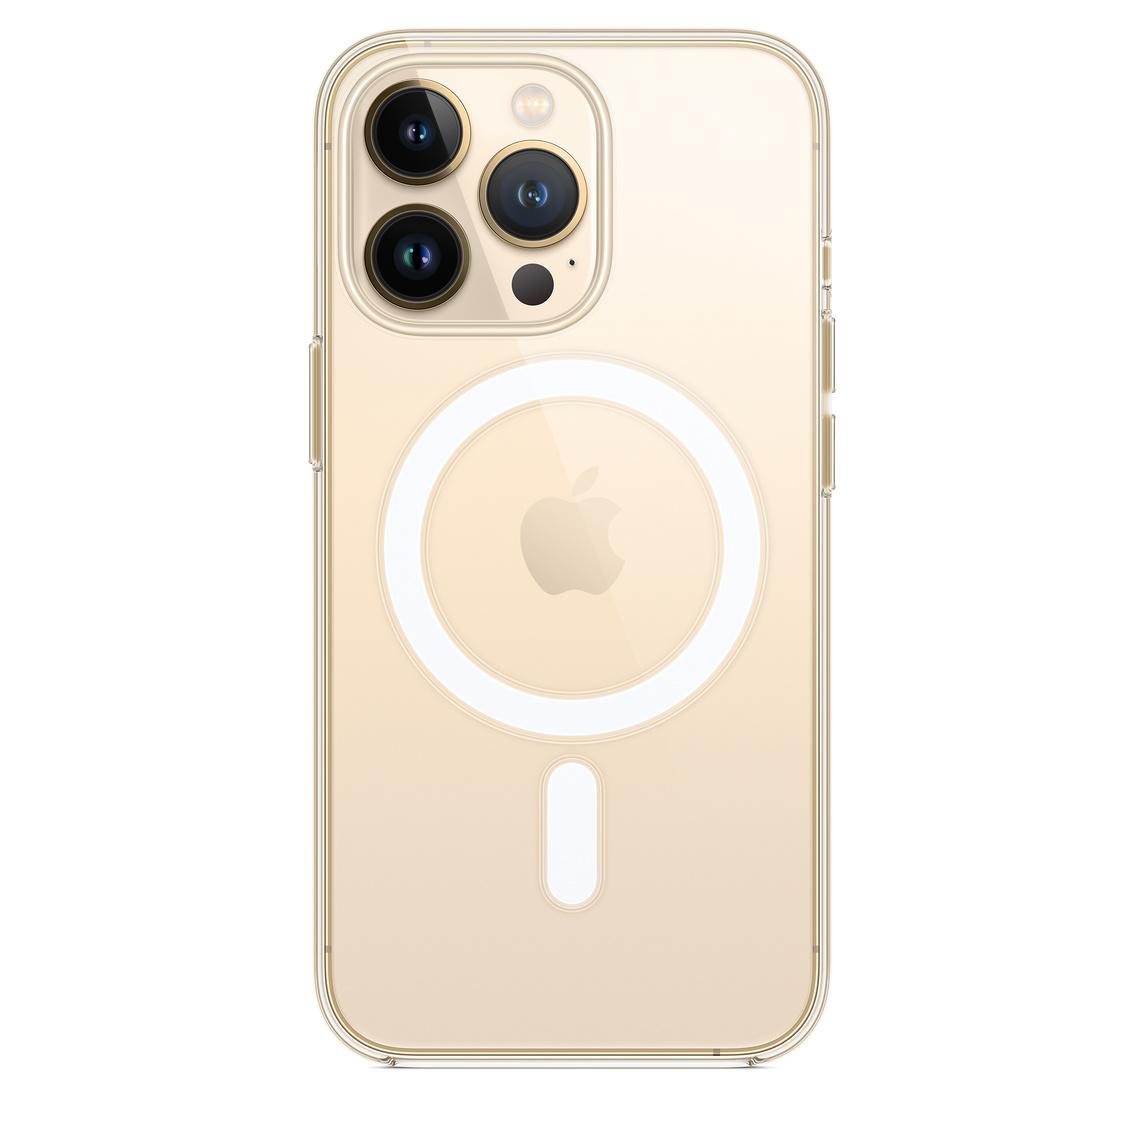 Ốp lưng iPhone 13 Pro Max Clear Case with MagSafe Chính Hãng